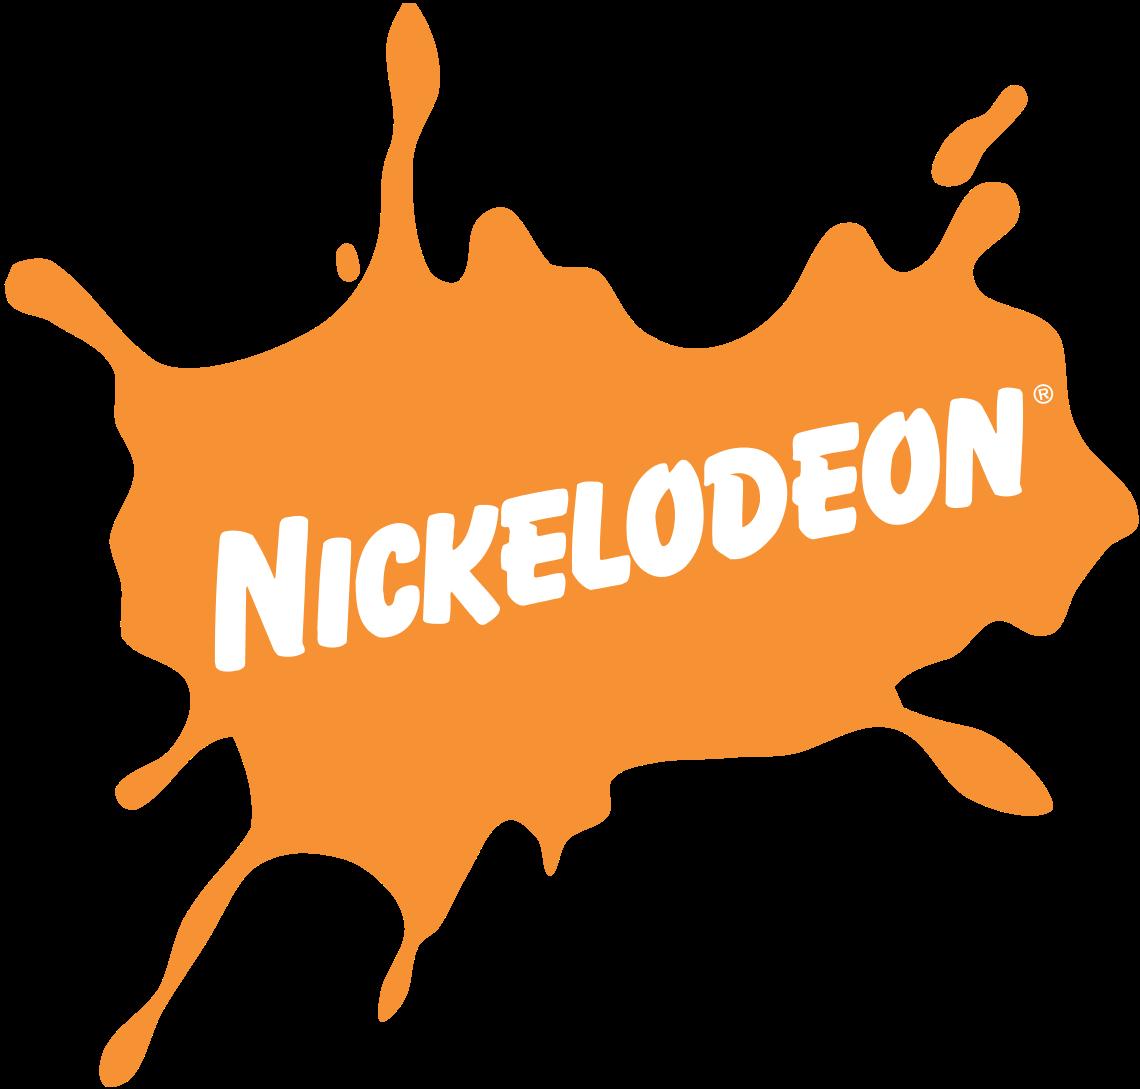 Nickelodeon Los Angeles Centerline Scenery